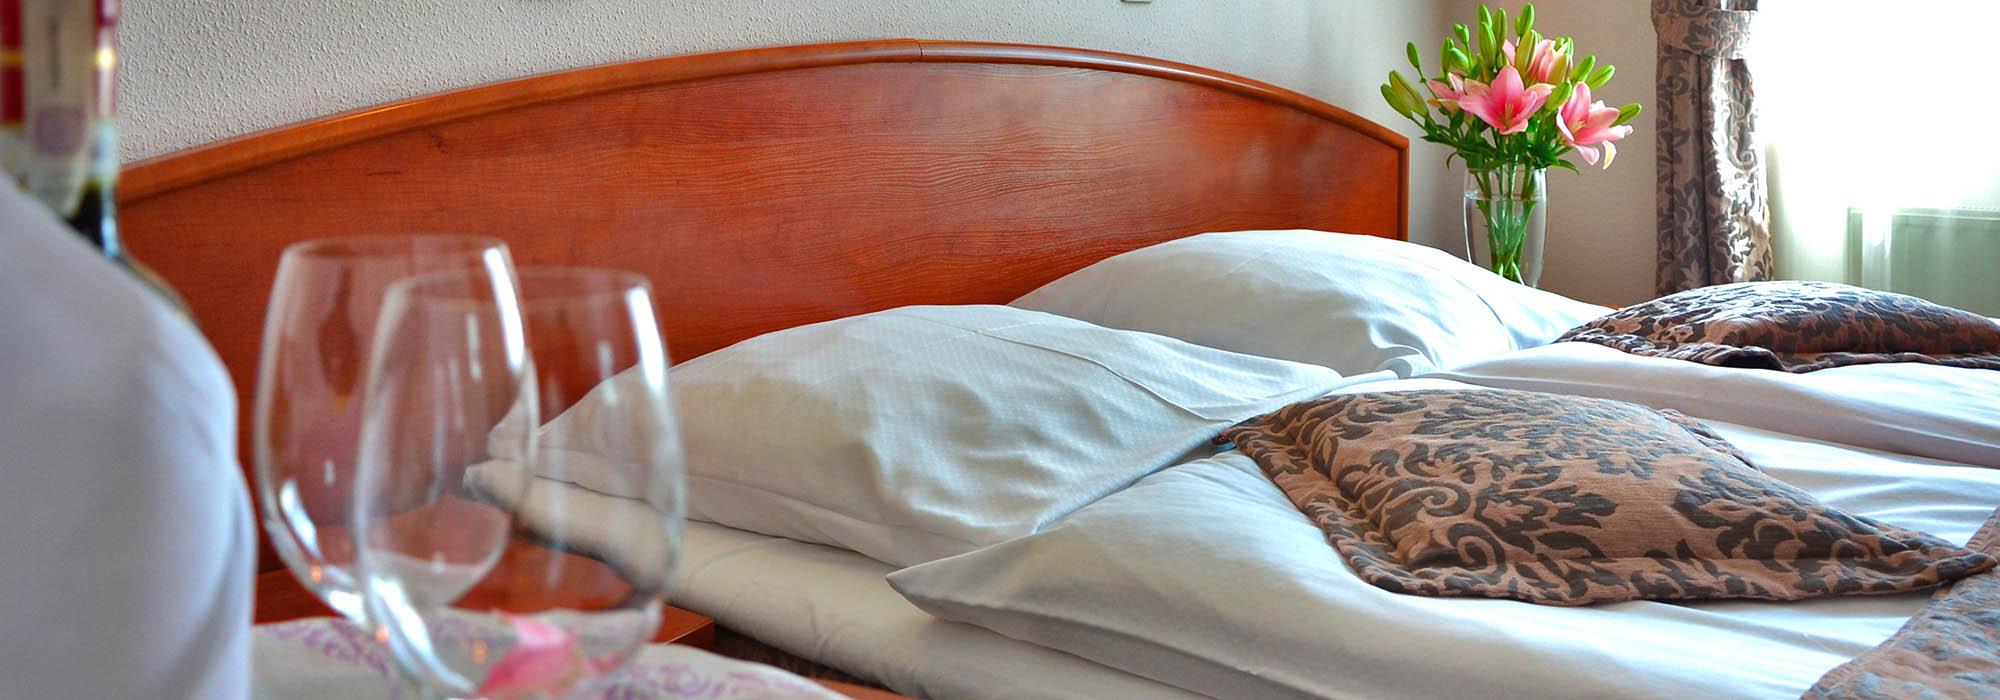 hotel-room-1261900-pixabay